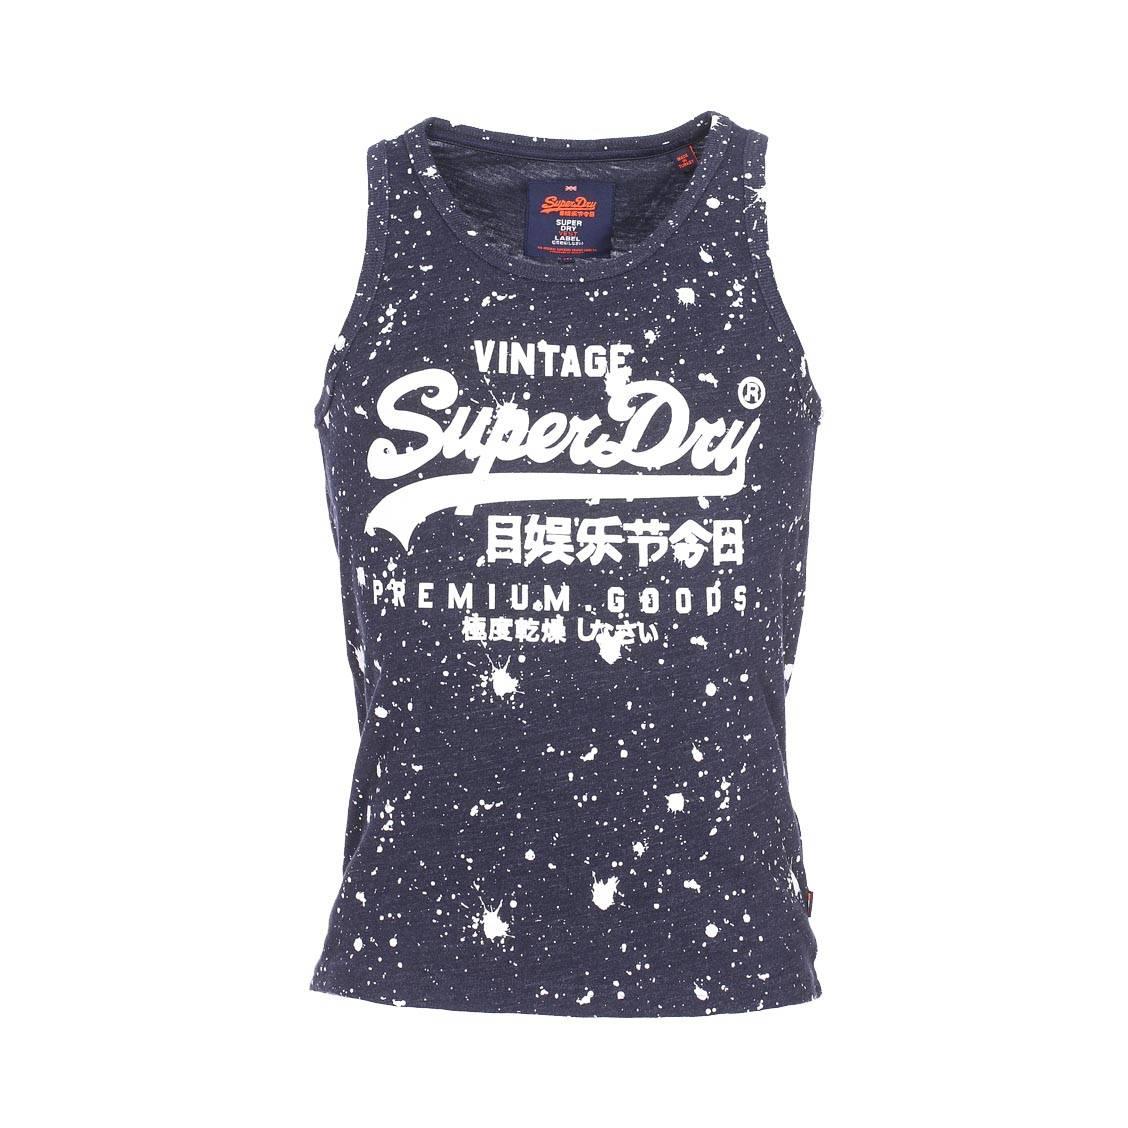 27ebae836a ... Tee-shirt Col rond Superdry homme. Débardeur Superdry Premium Goods  Paint Splatter bleu indigo à motifs blancs ...